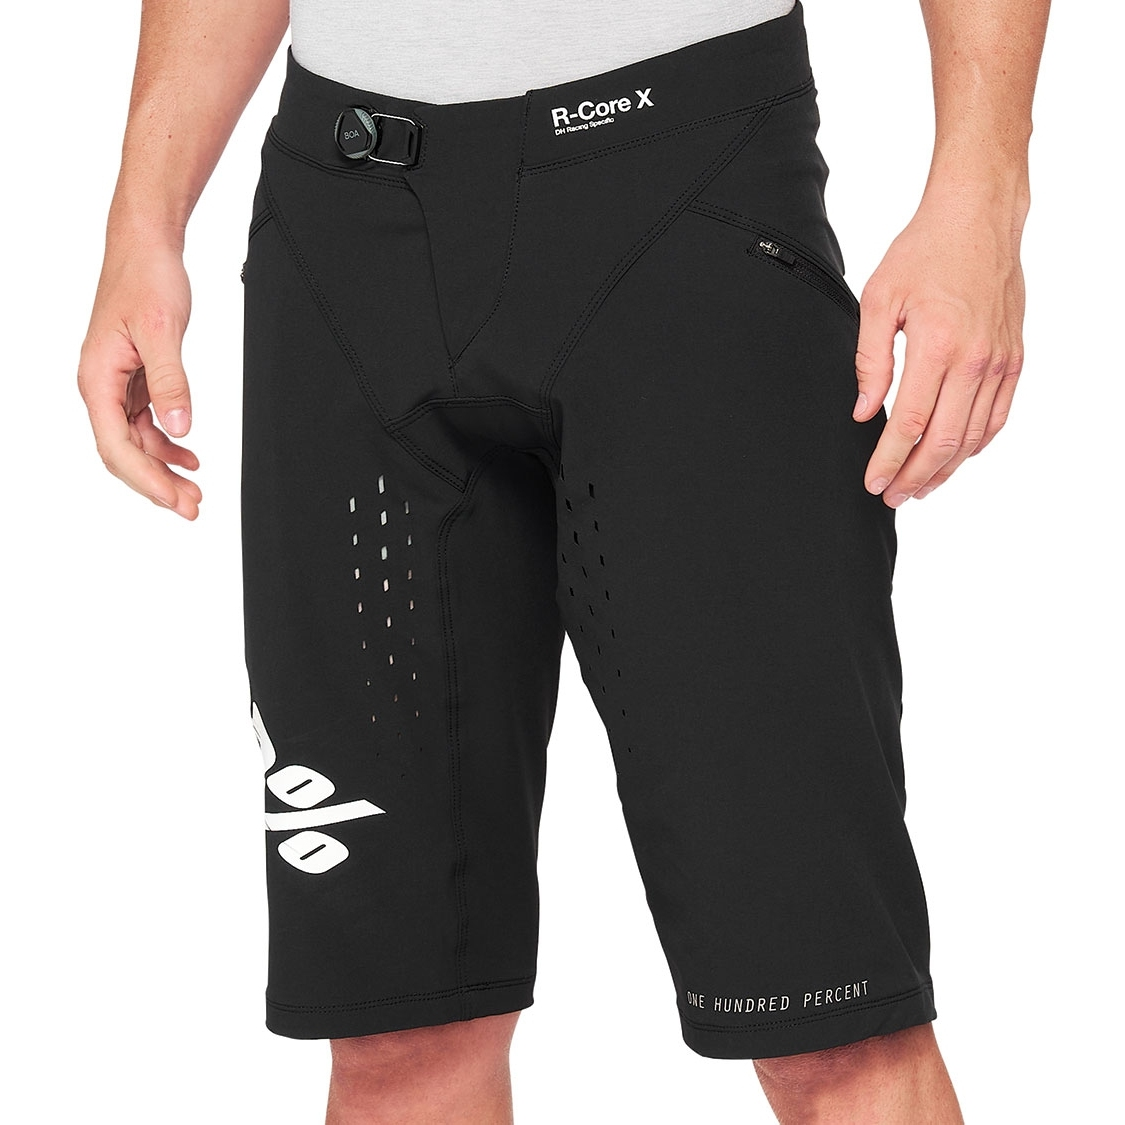 100% R-Core Youth Pantalones - negro